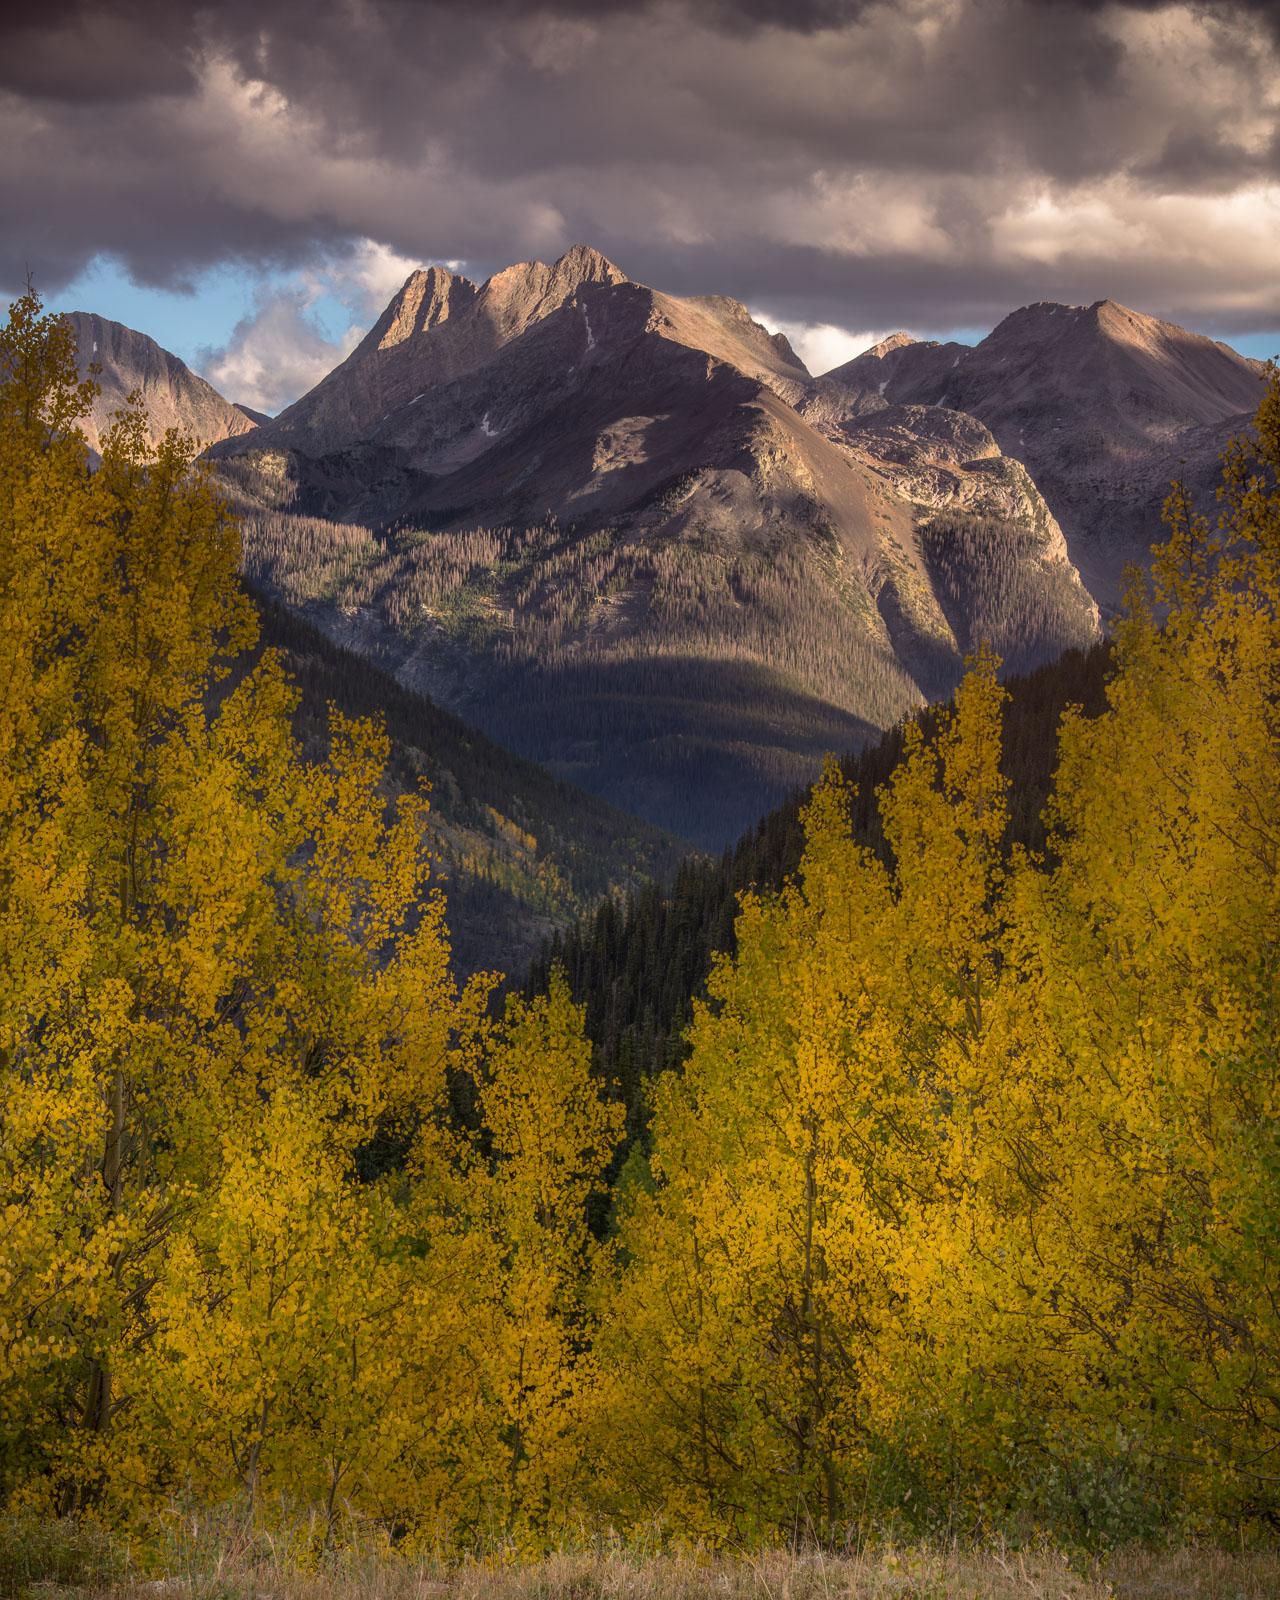 The Needle Mountains and autumn aspens, San Juan Mountains, Colorado.